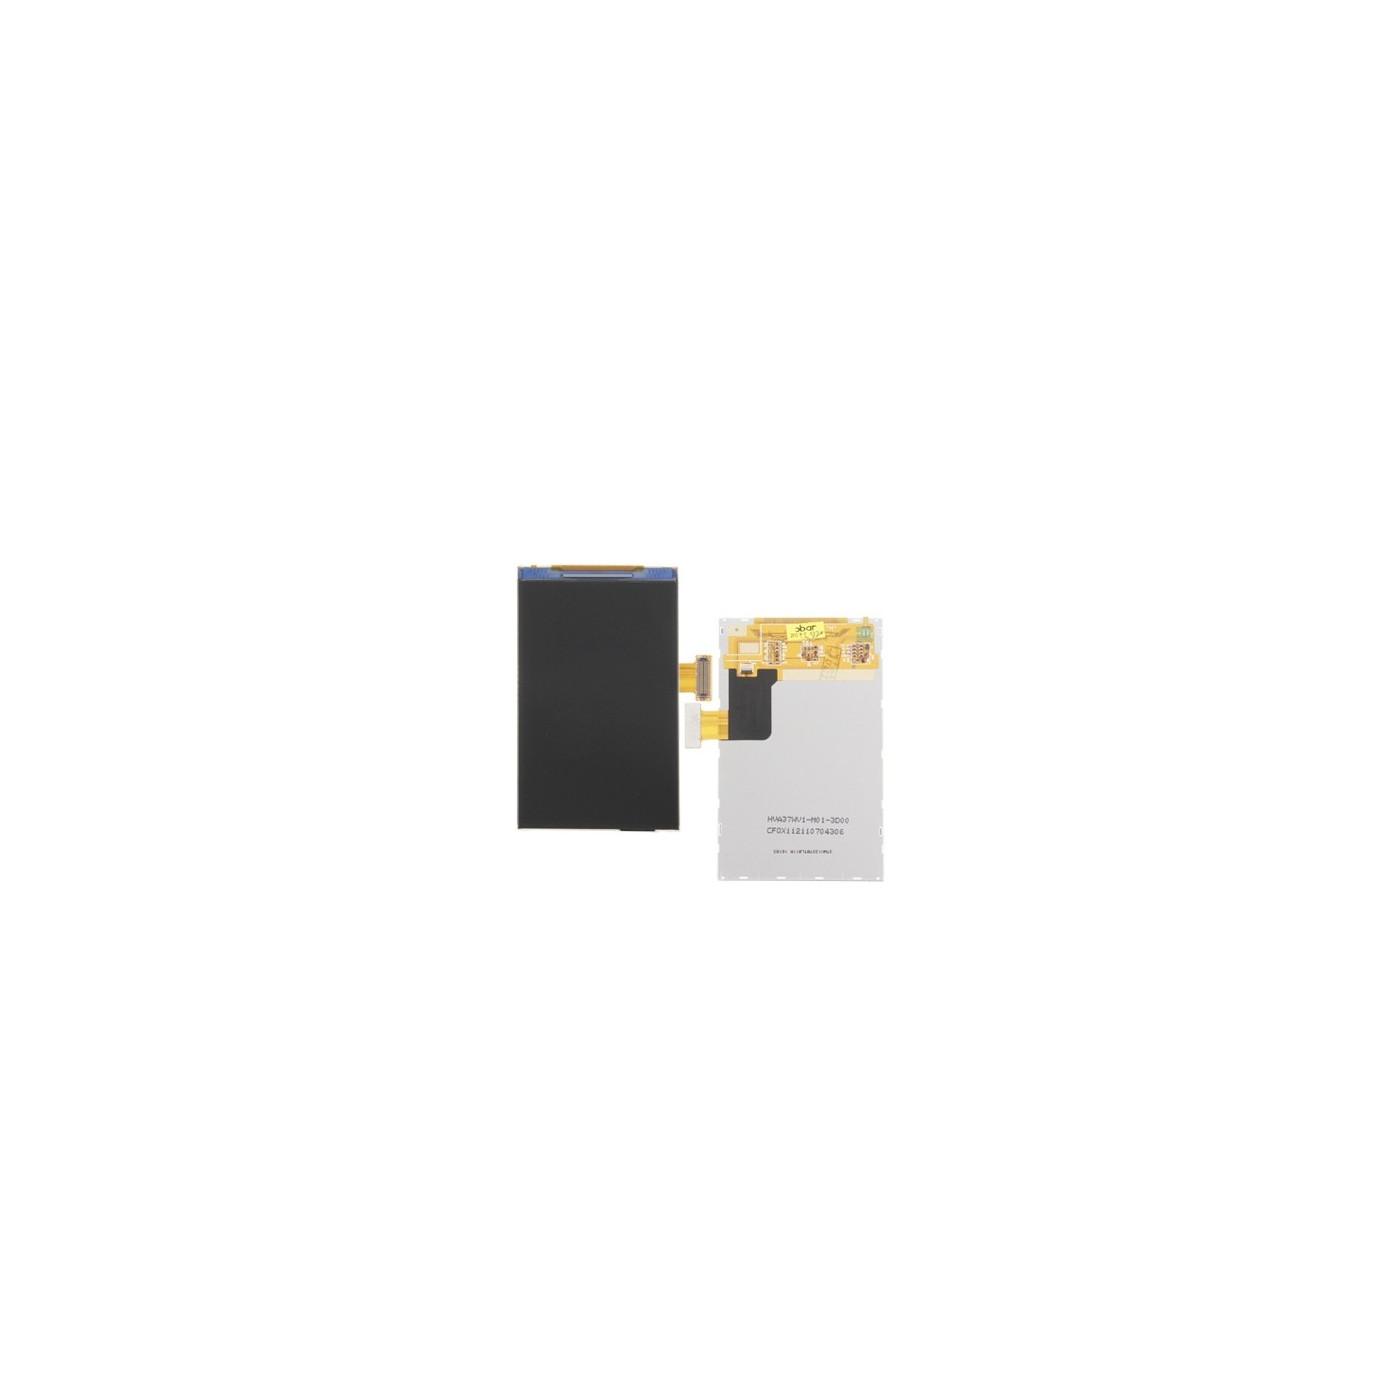 Ecran LCD pour écran Samsung Galaxy W i8150